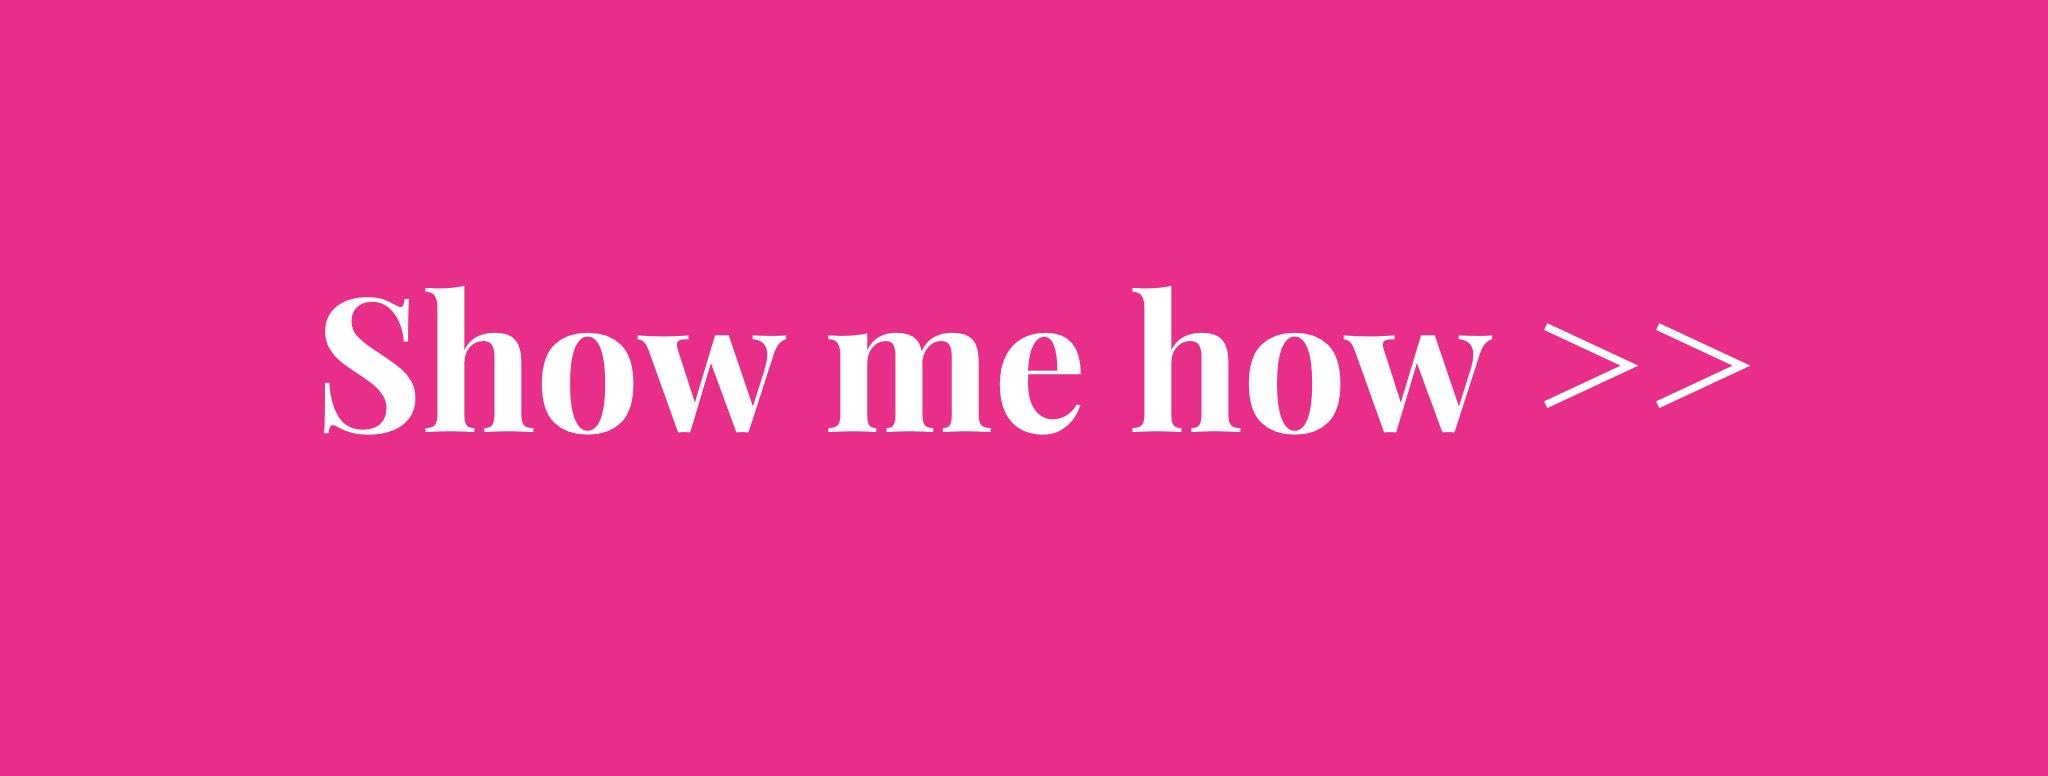 show-me-how.jpg